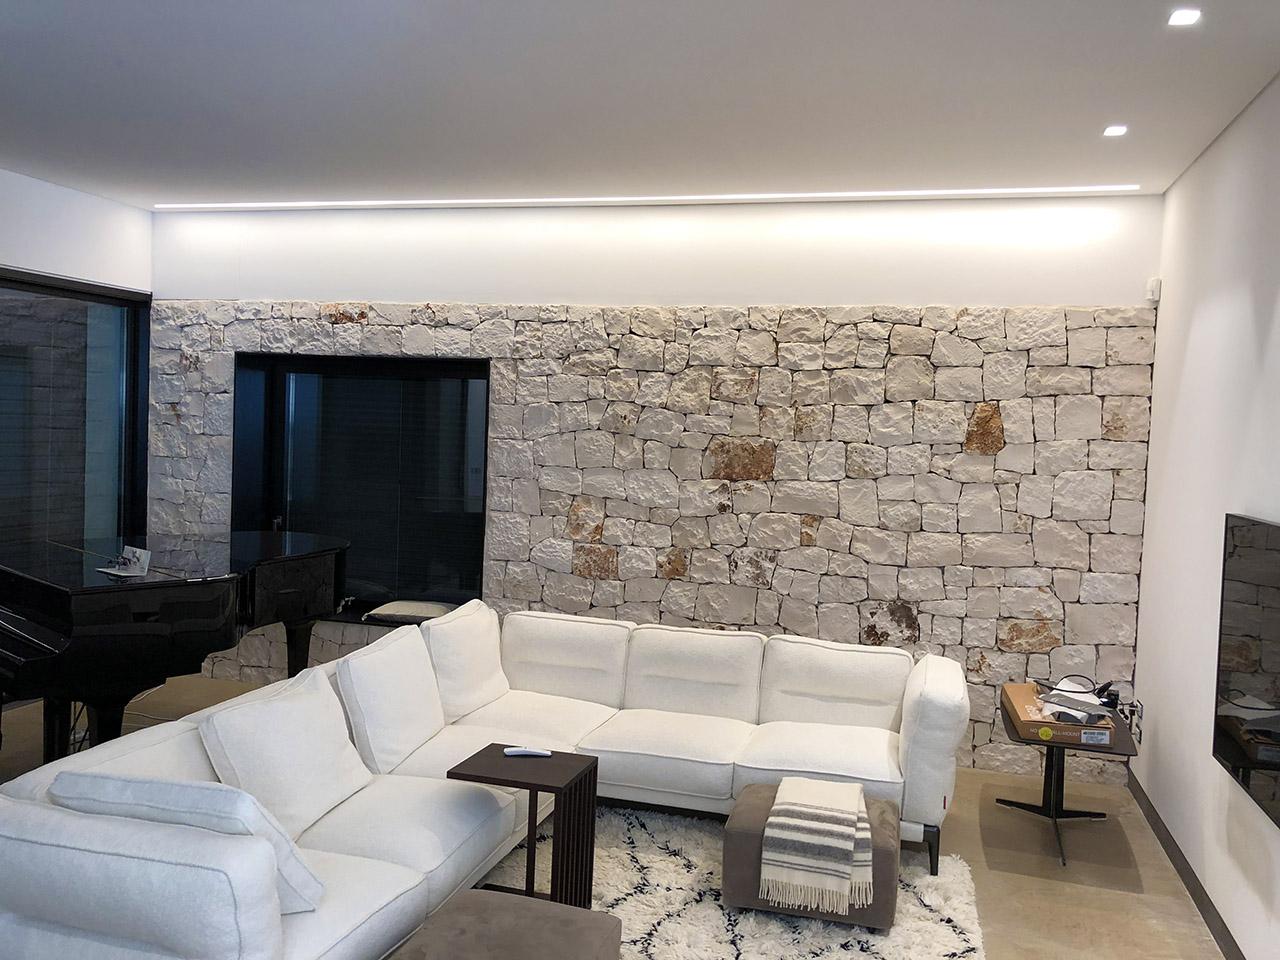 costruzioni restauri sirio ostuni nuova residenza privata chiobbica ostuni img 5062